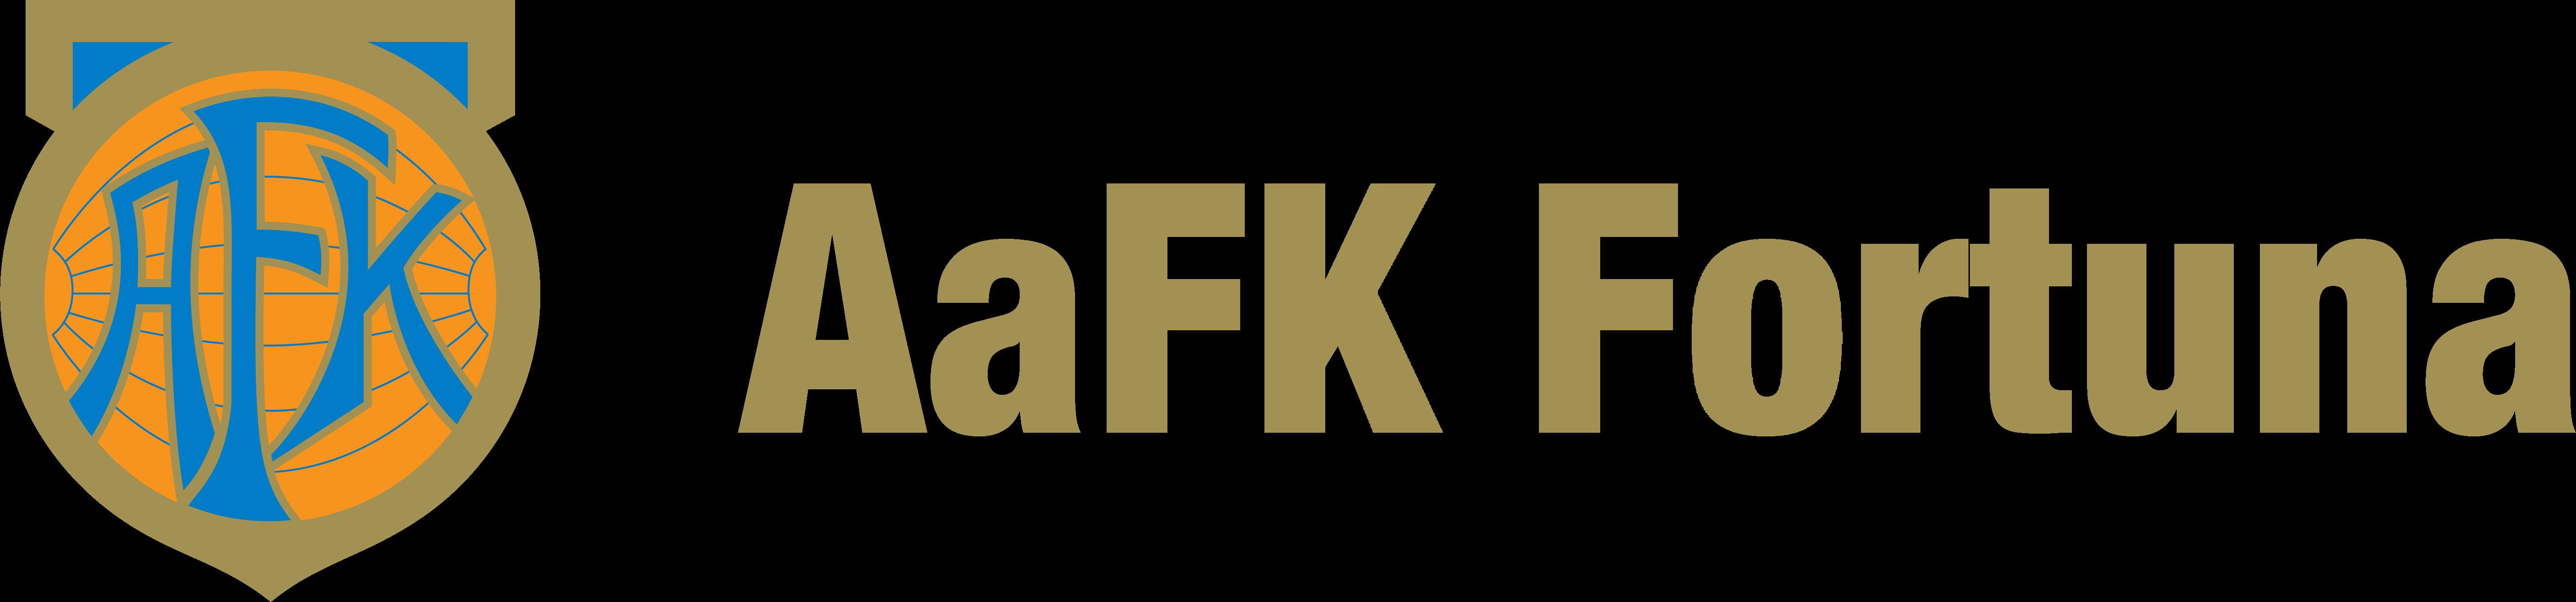 AaFK Fortuna